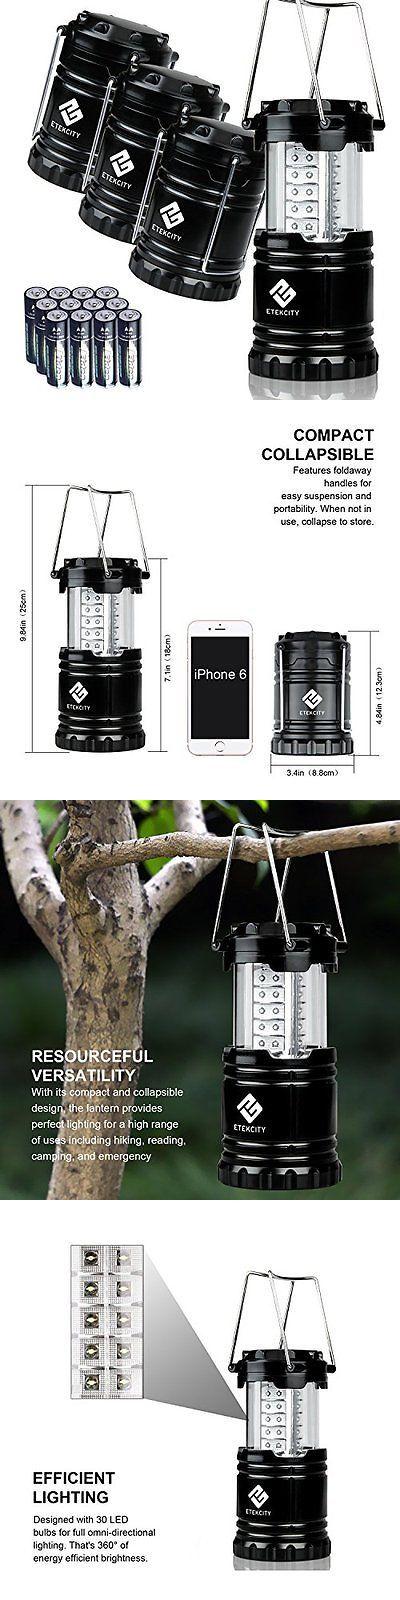 Lanterns 168867: Etekcity Lanterns 4 Pack Portable Outdoor Led Camping Lantern With 12 Aa (Black, -> BUY IT NOW ONLY: $39.78 on eBay!